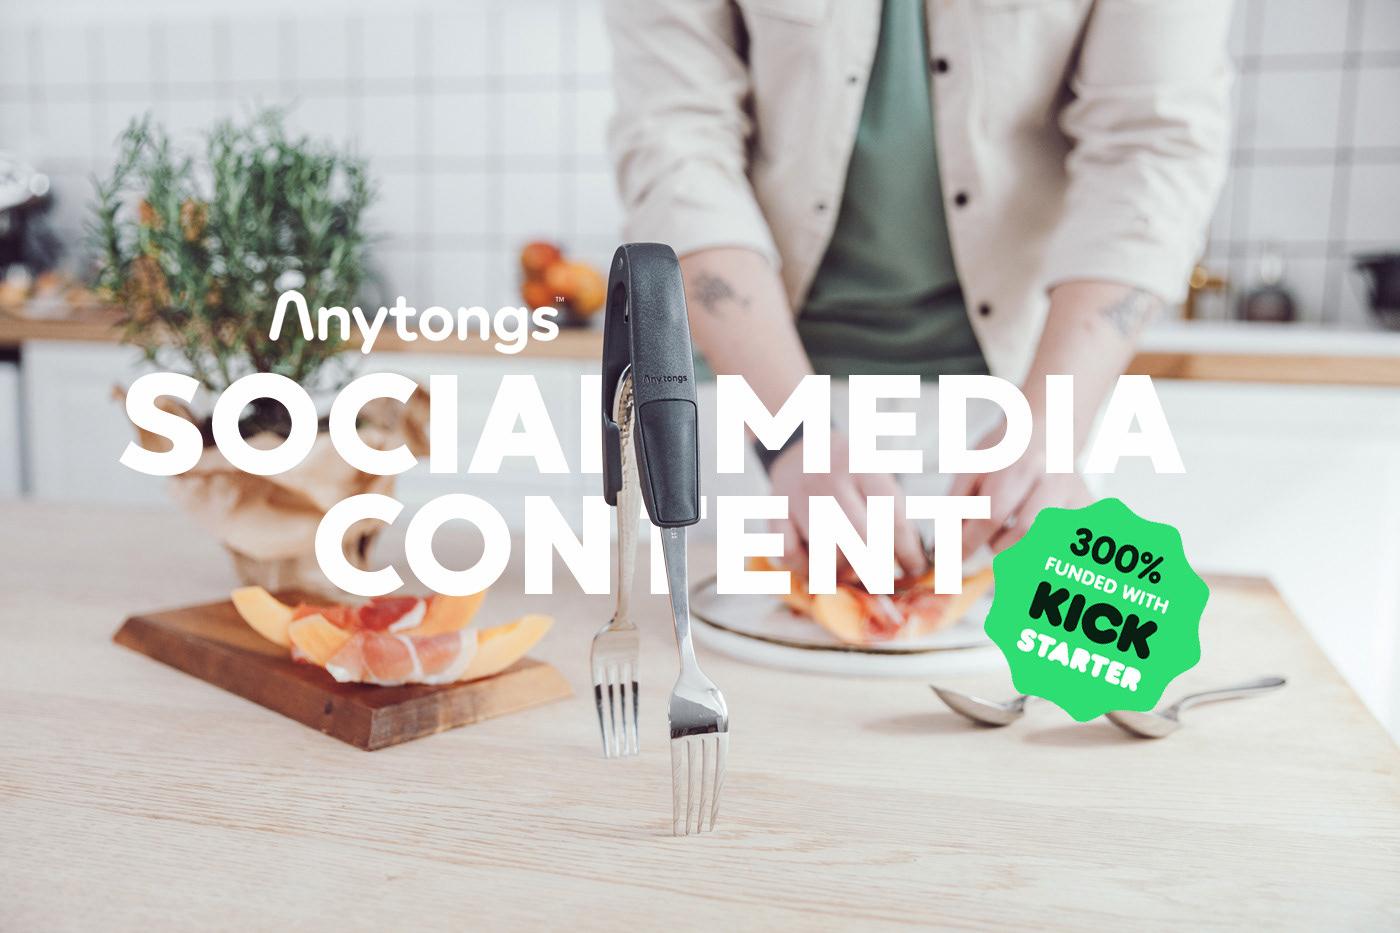 food photo food video instagram kitchen SMM social media Startup utencil